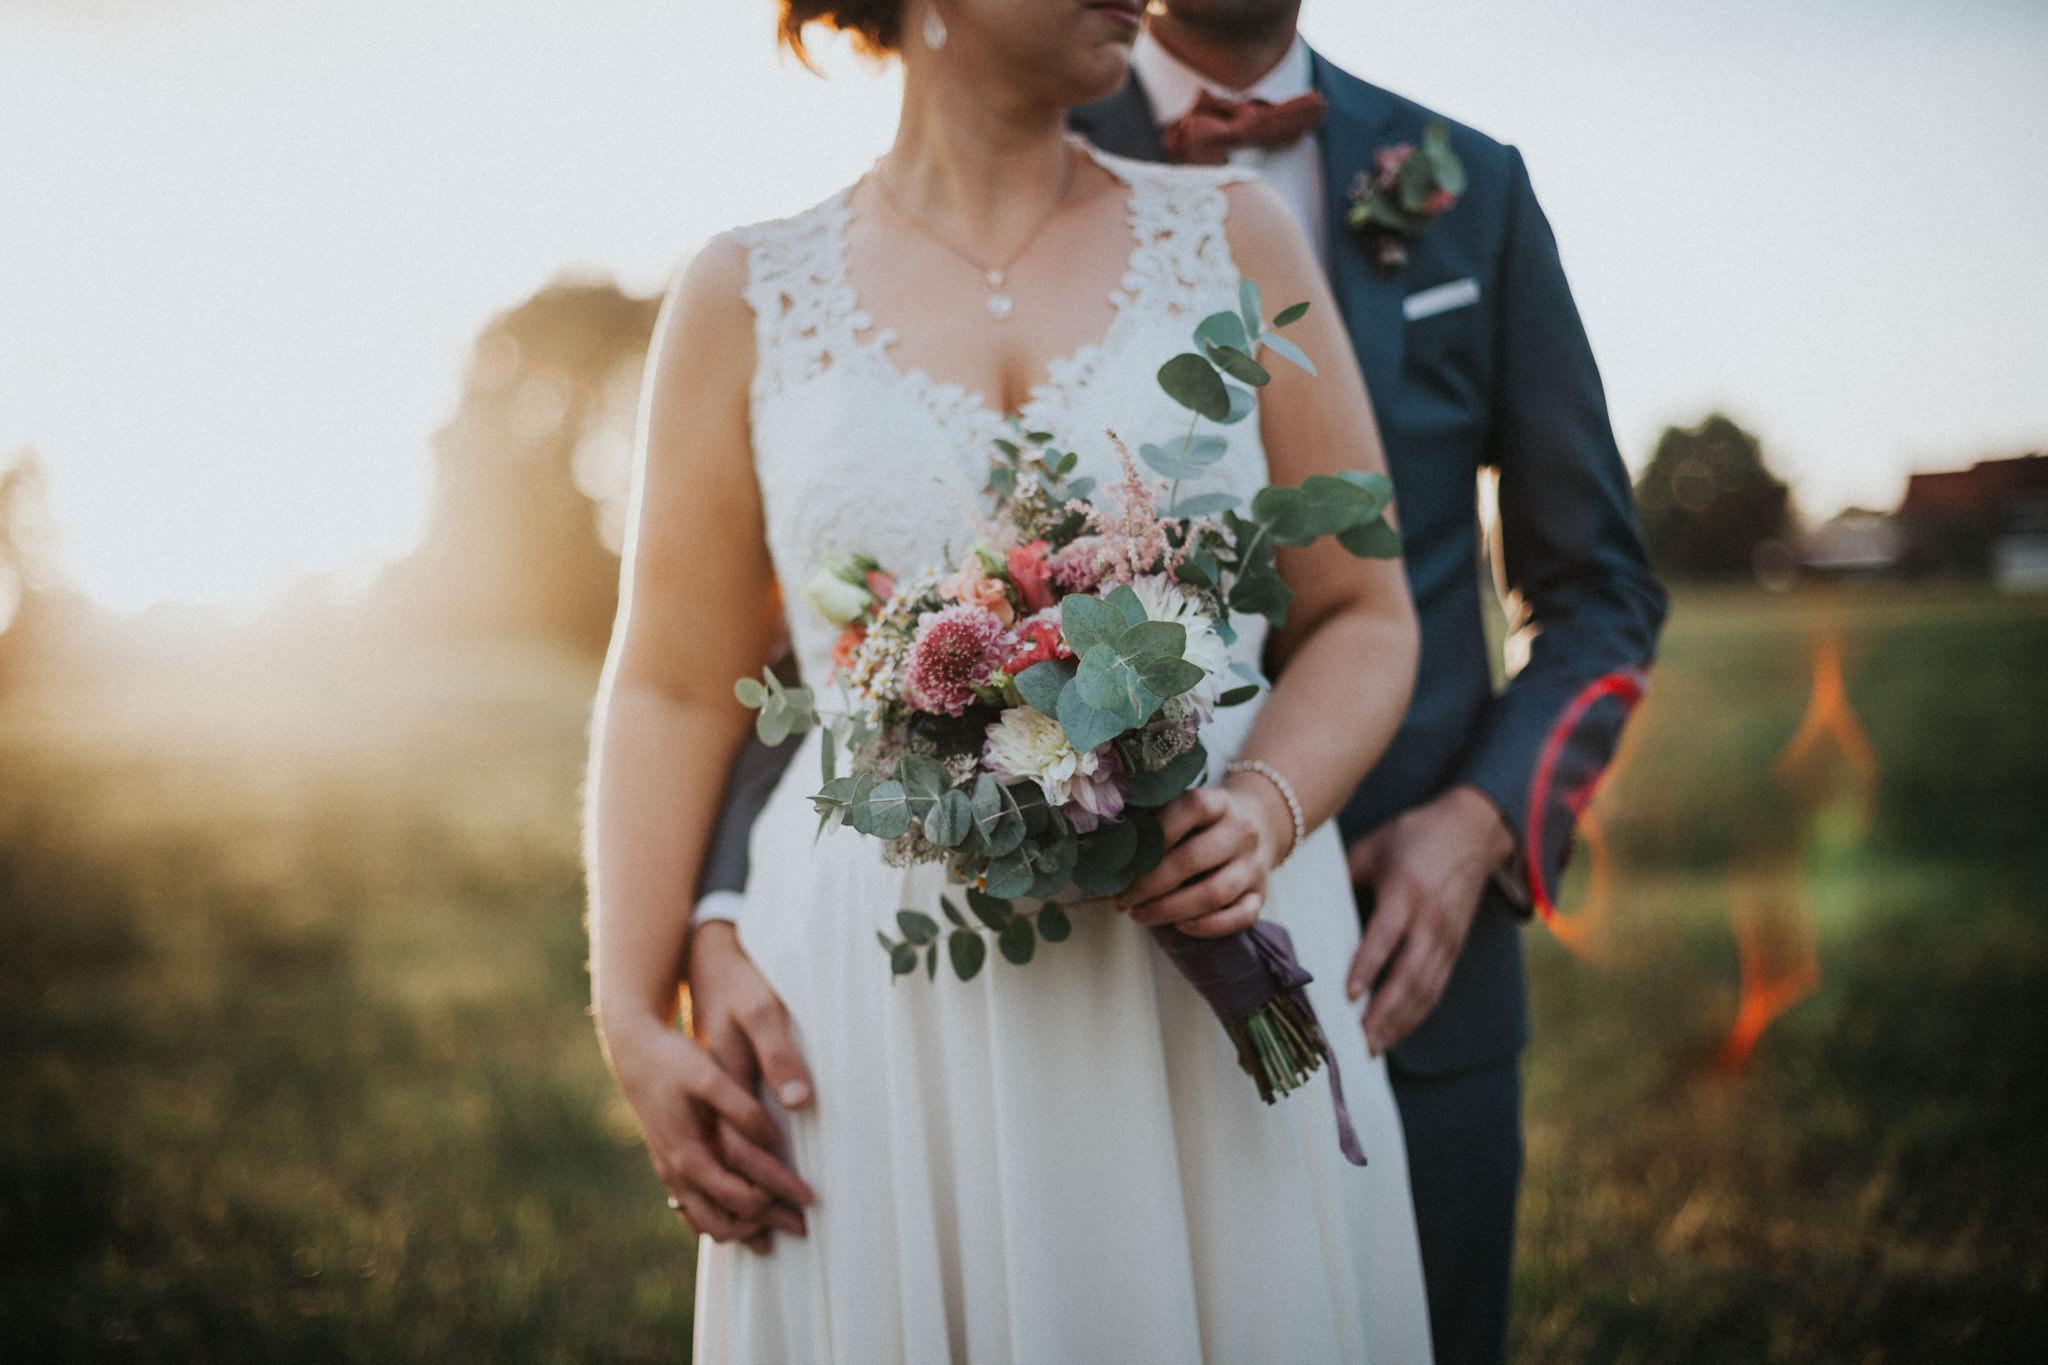 Hochzeitsfotograf-Homberg-59.jpg